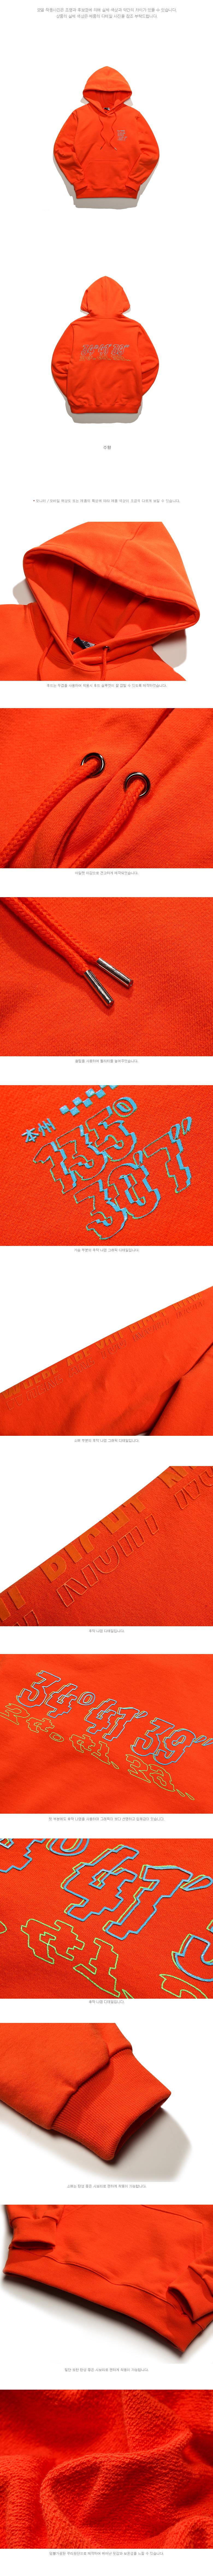 YRHD6122_detail_orange.jpg